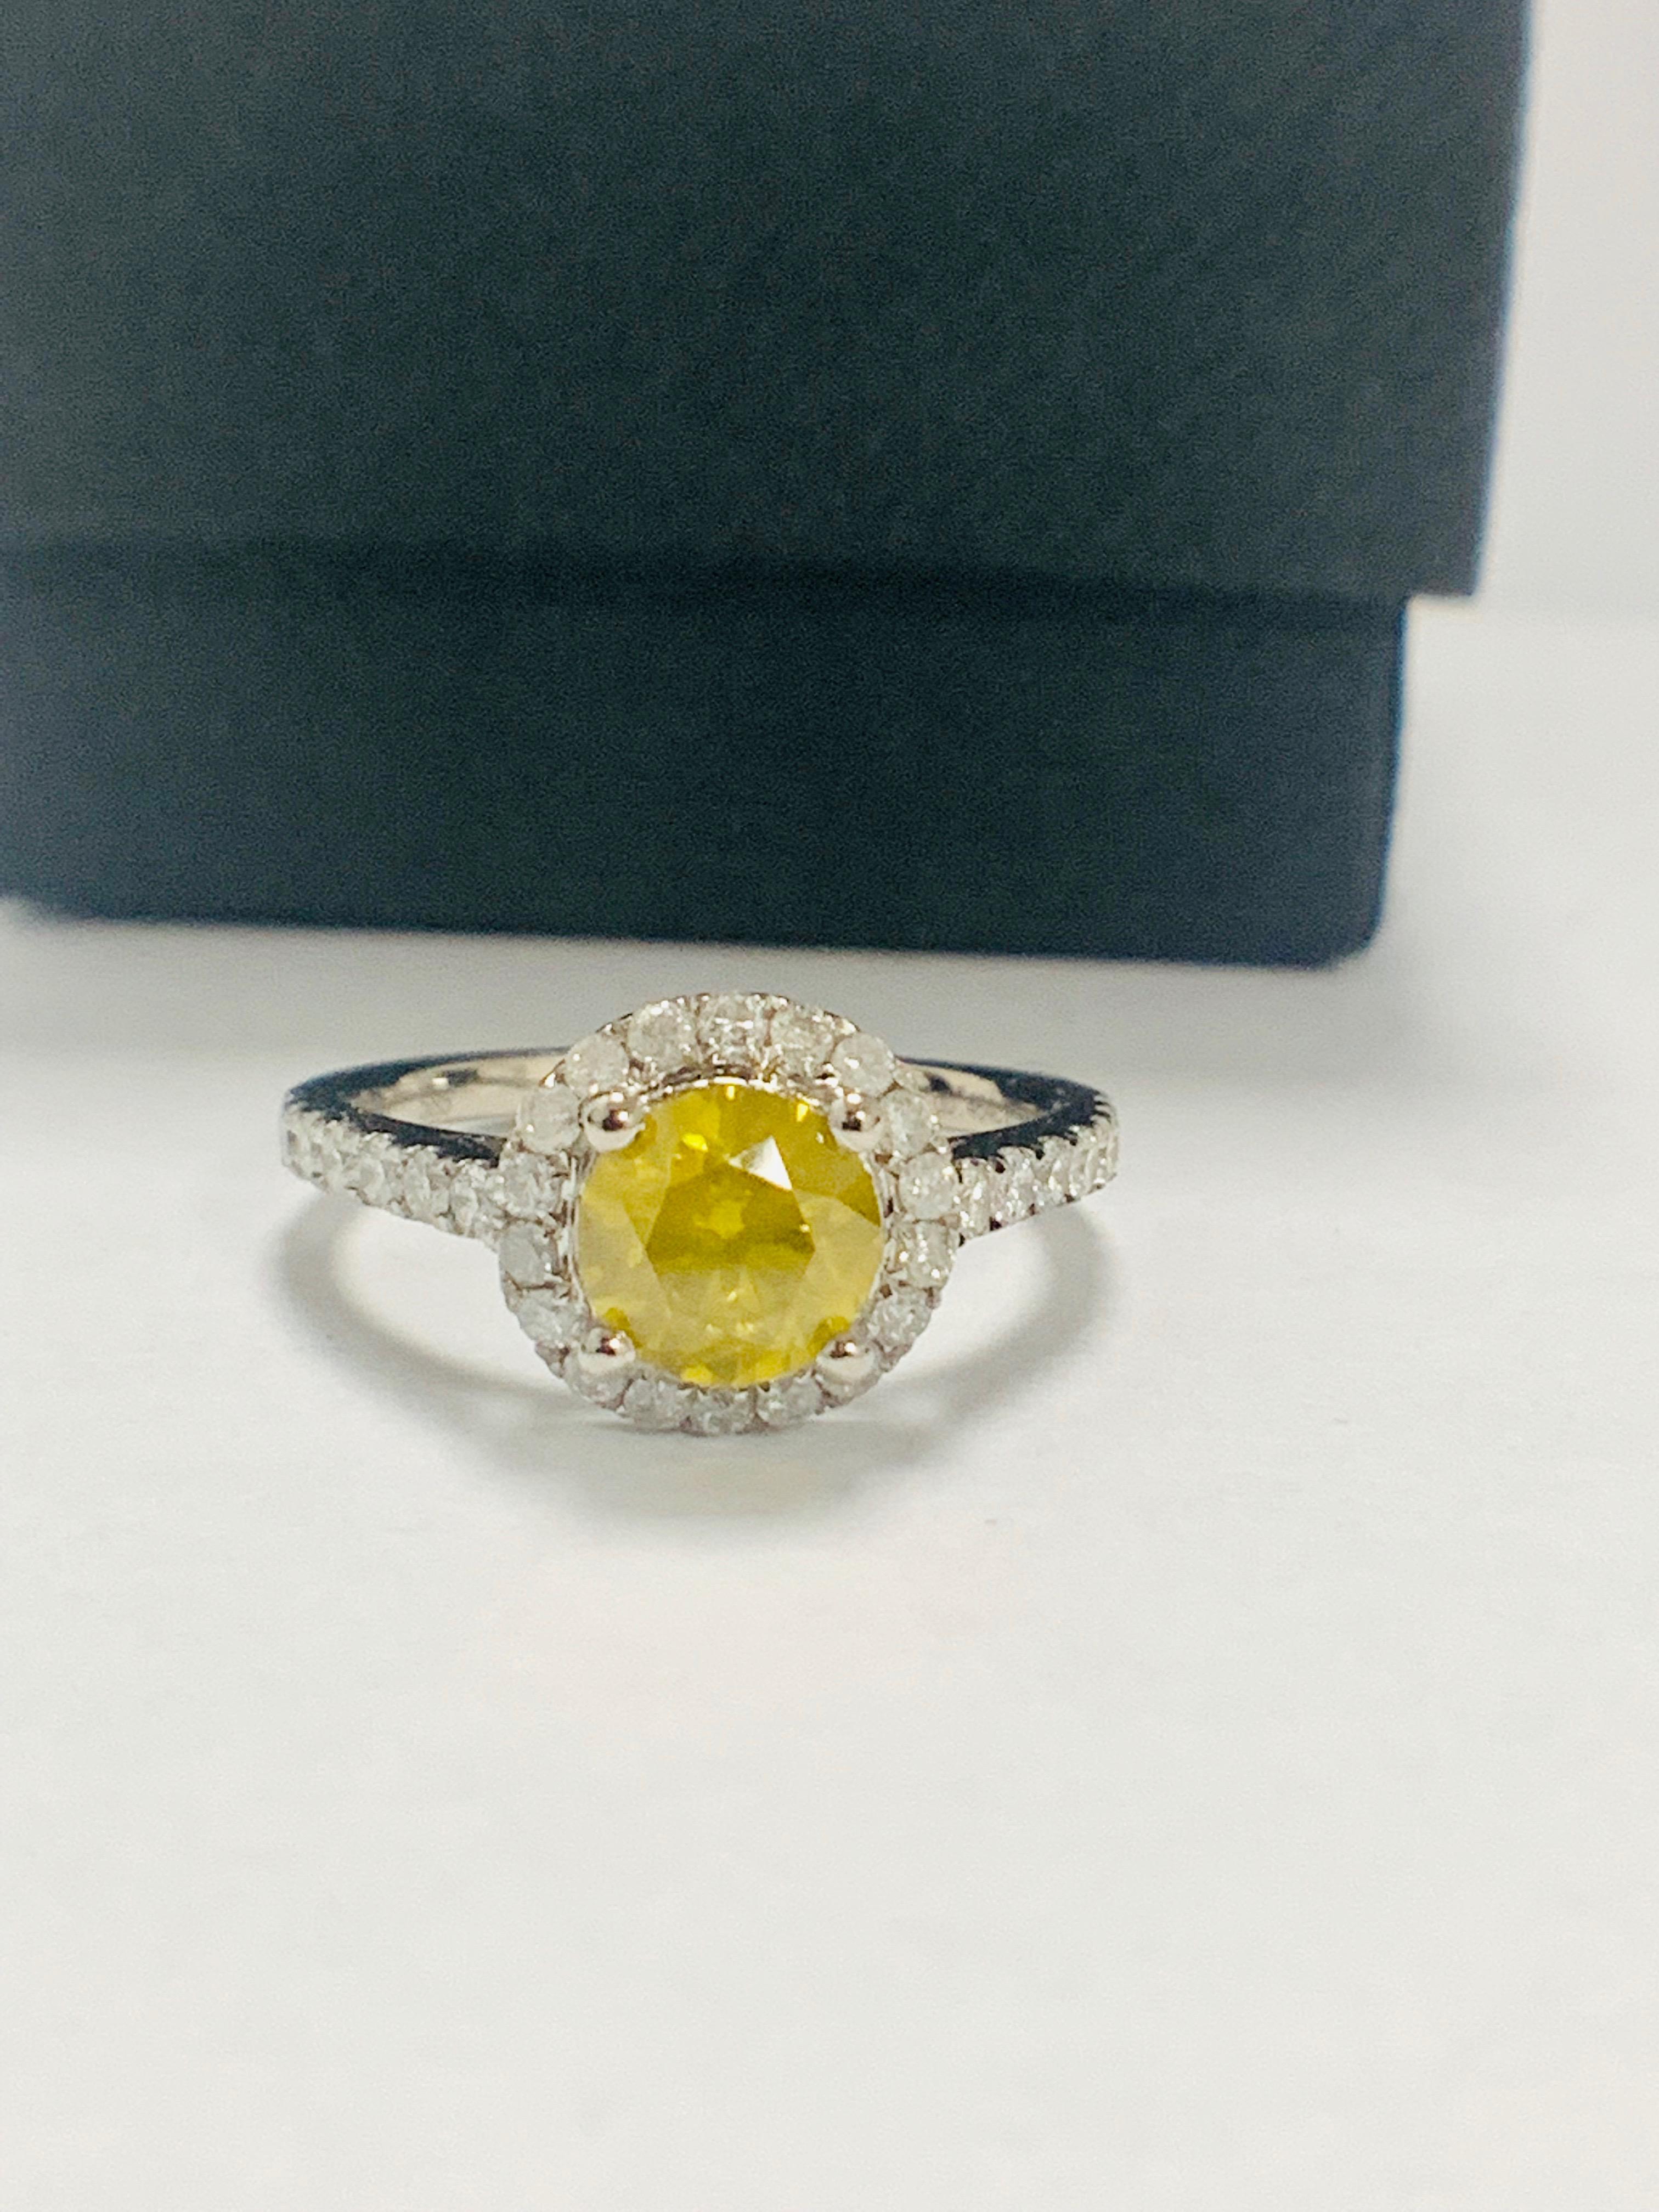 14ct White Gold Diamond ring featuring centre, round brilliant cut, yellow Diamond (1.08ct) - Image 9 of 12